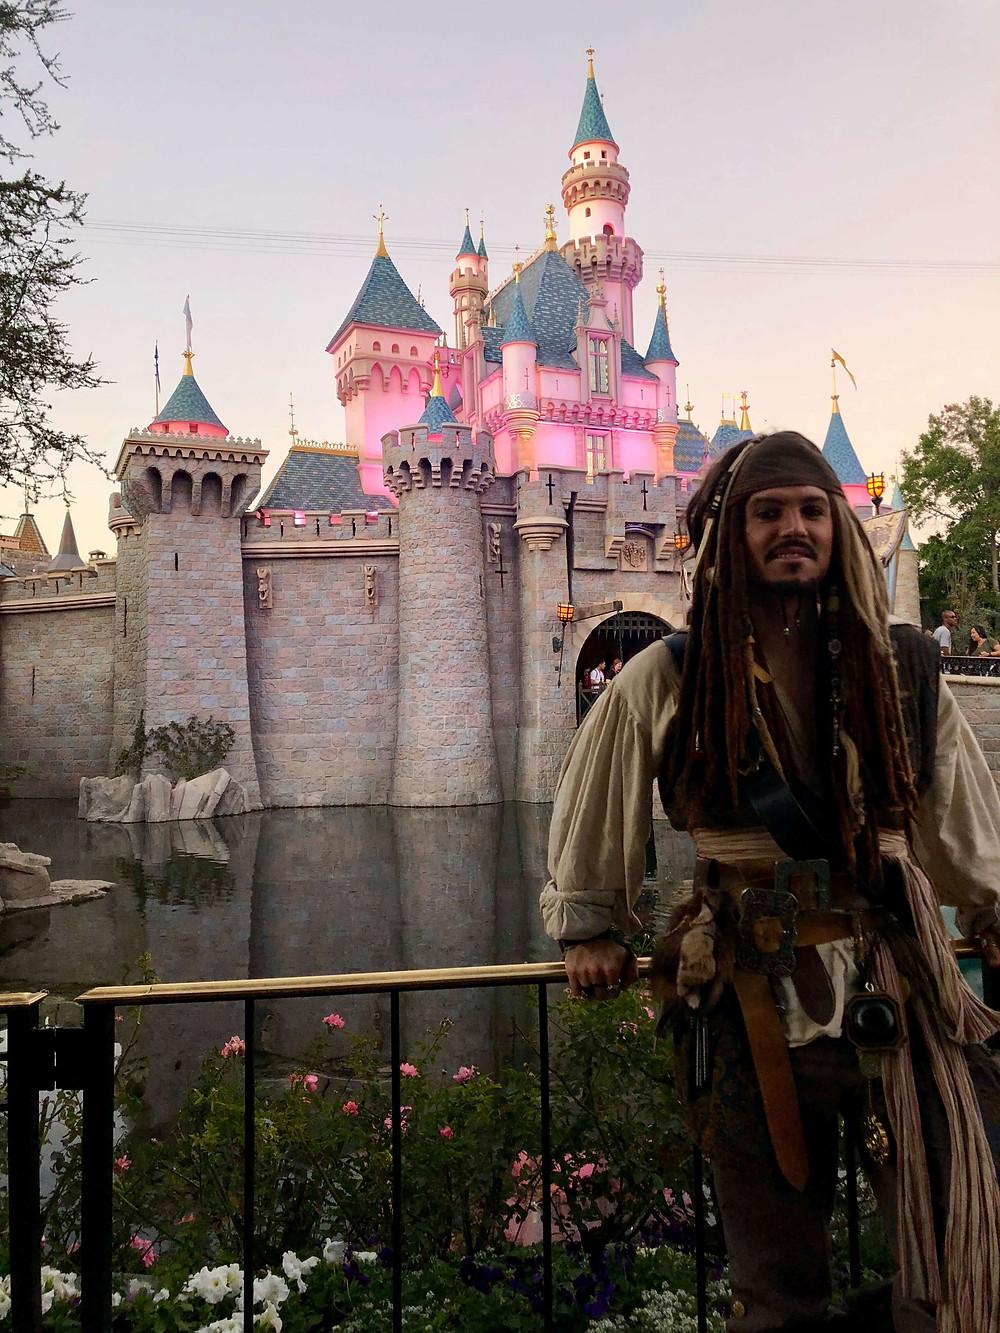 Captain Jack, guest blogger for the fandombar.com Community bLog: Disneyland's 65th Anniversary by Captain Jack!